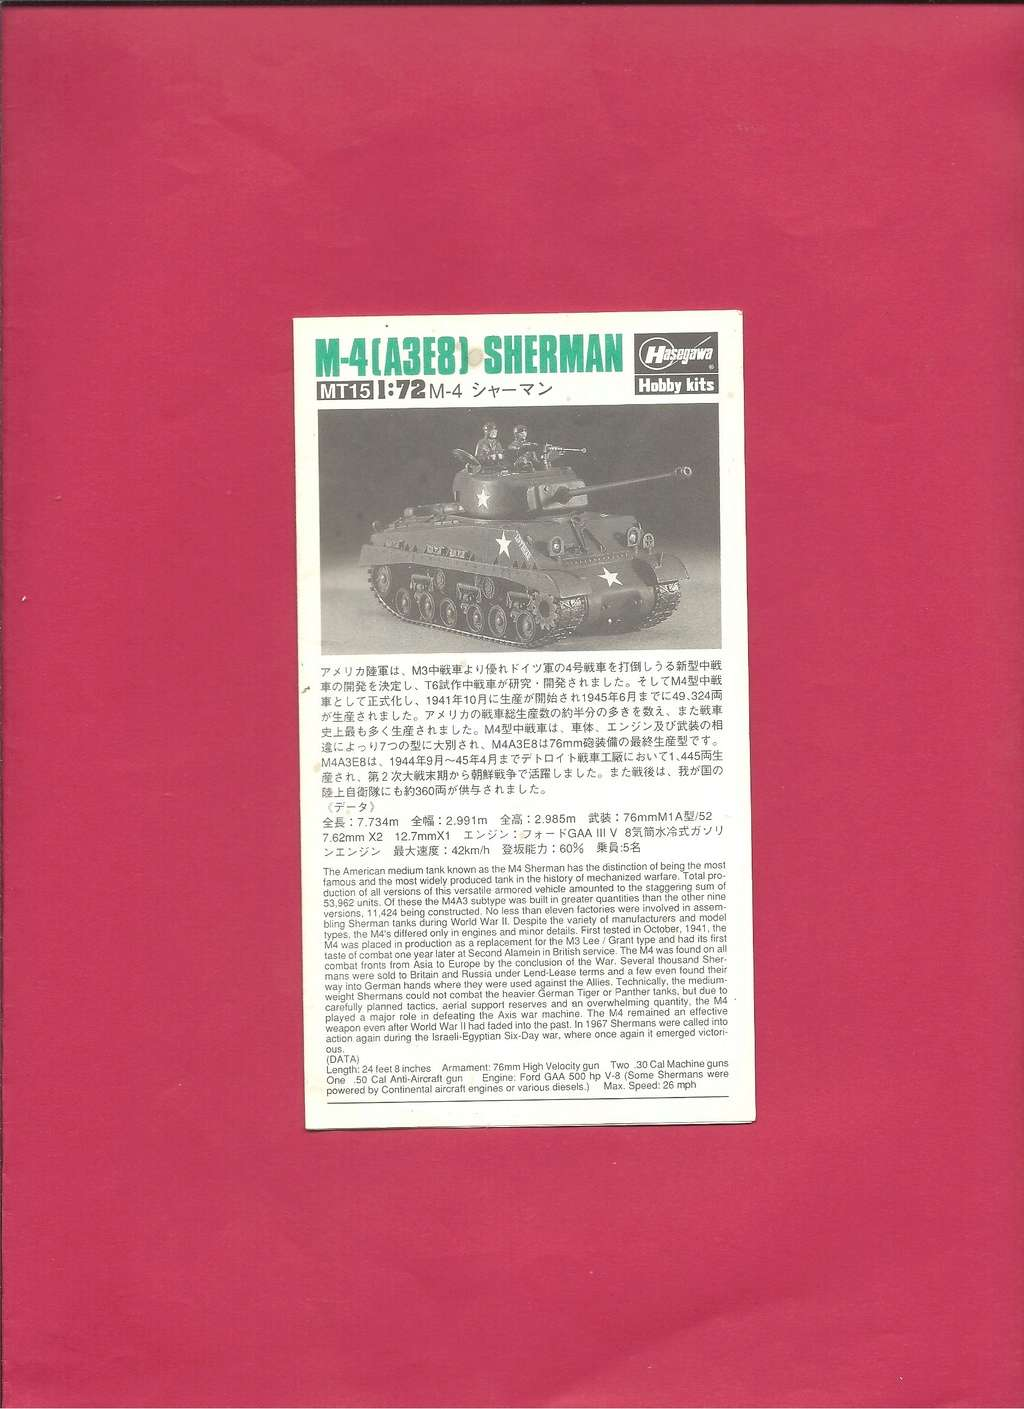 [HASEGAWA] Char M4 (A3E8) SHERMAN 1/72ème Réf MT 15 Notice Hasega16